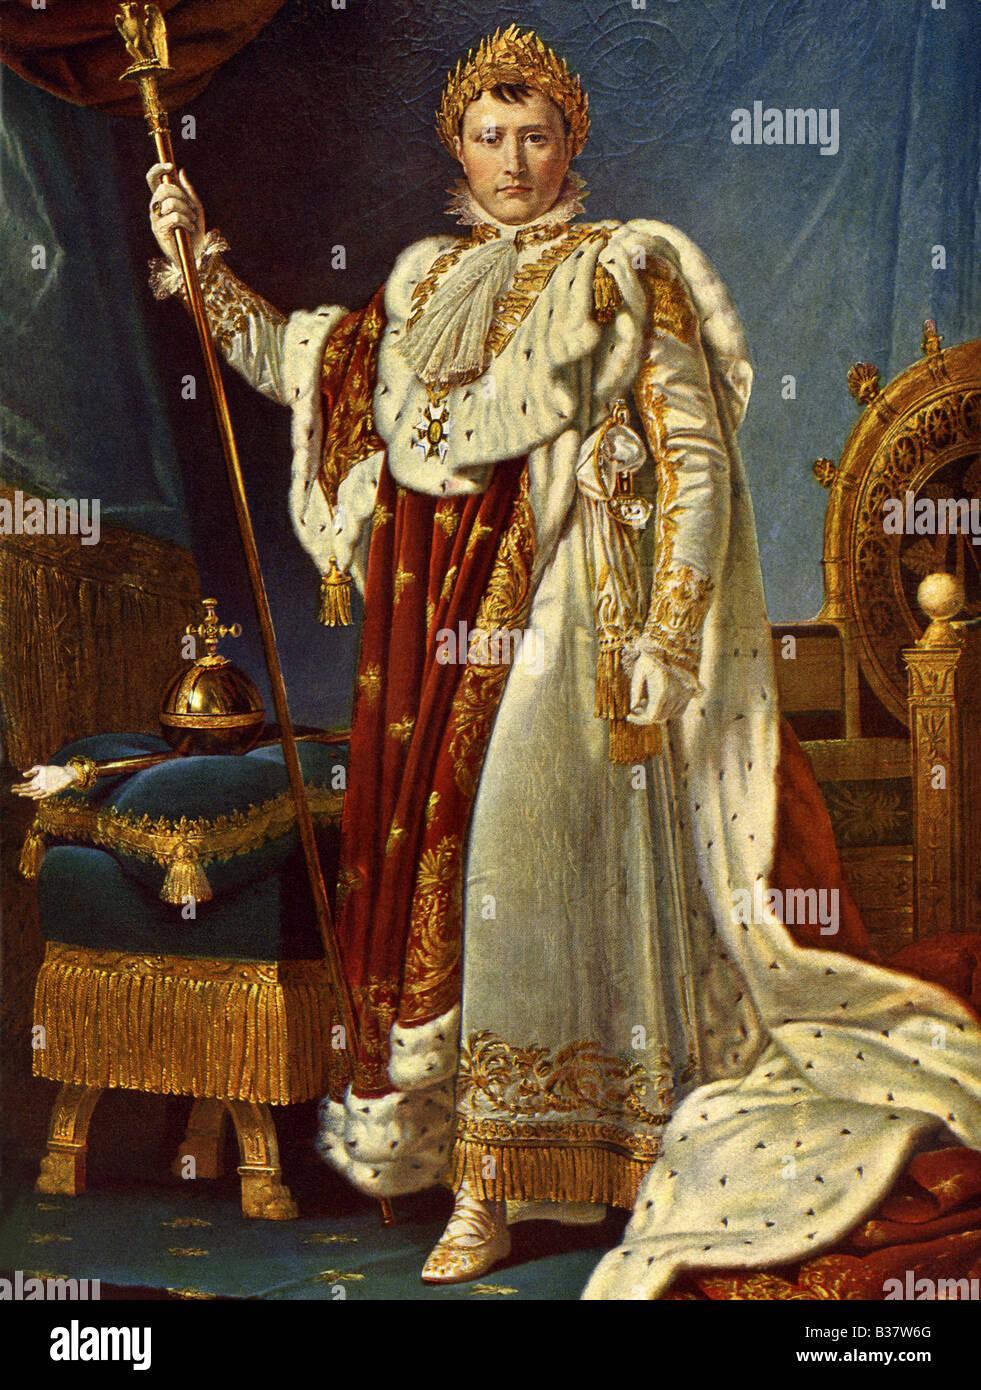 Napoleon by Gerard - Stock Image